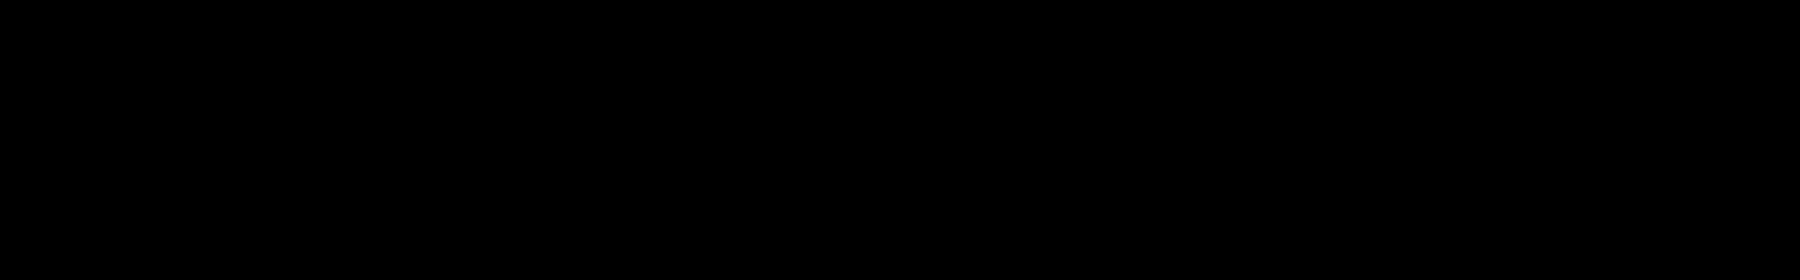 TECHNO Server audio waveform